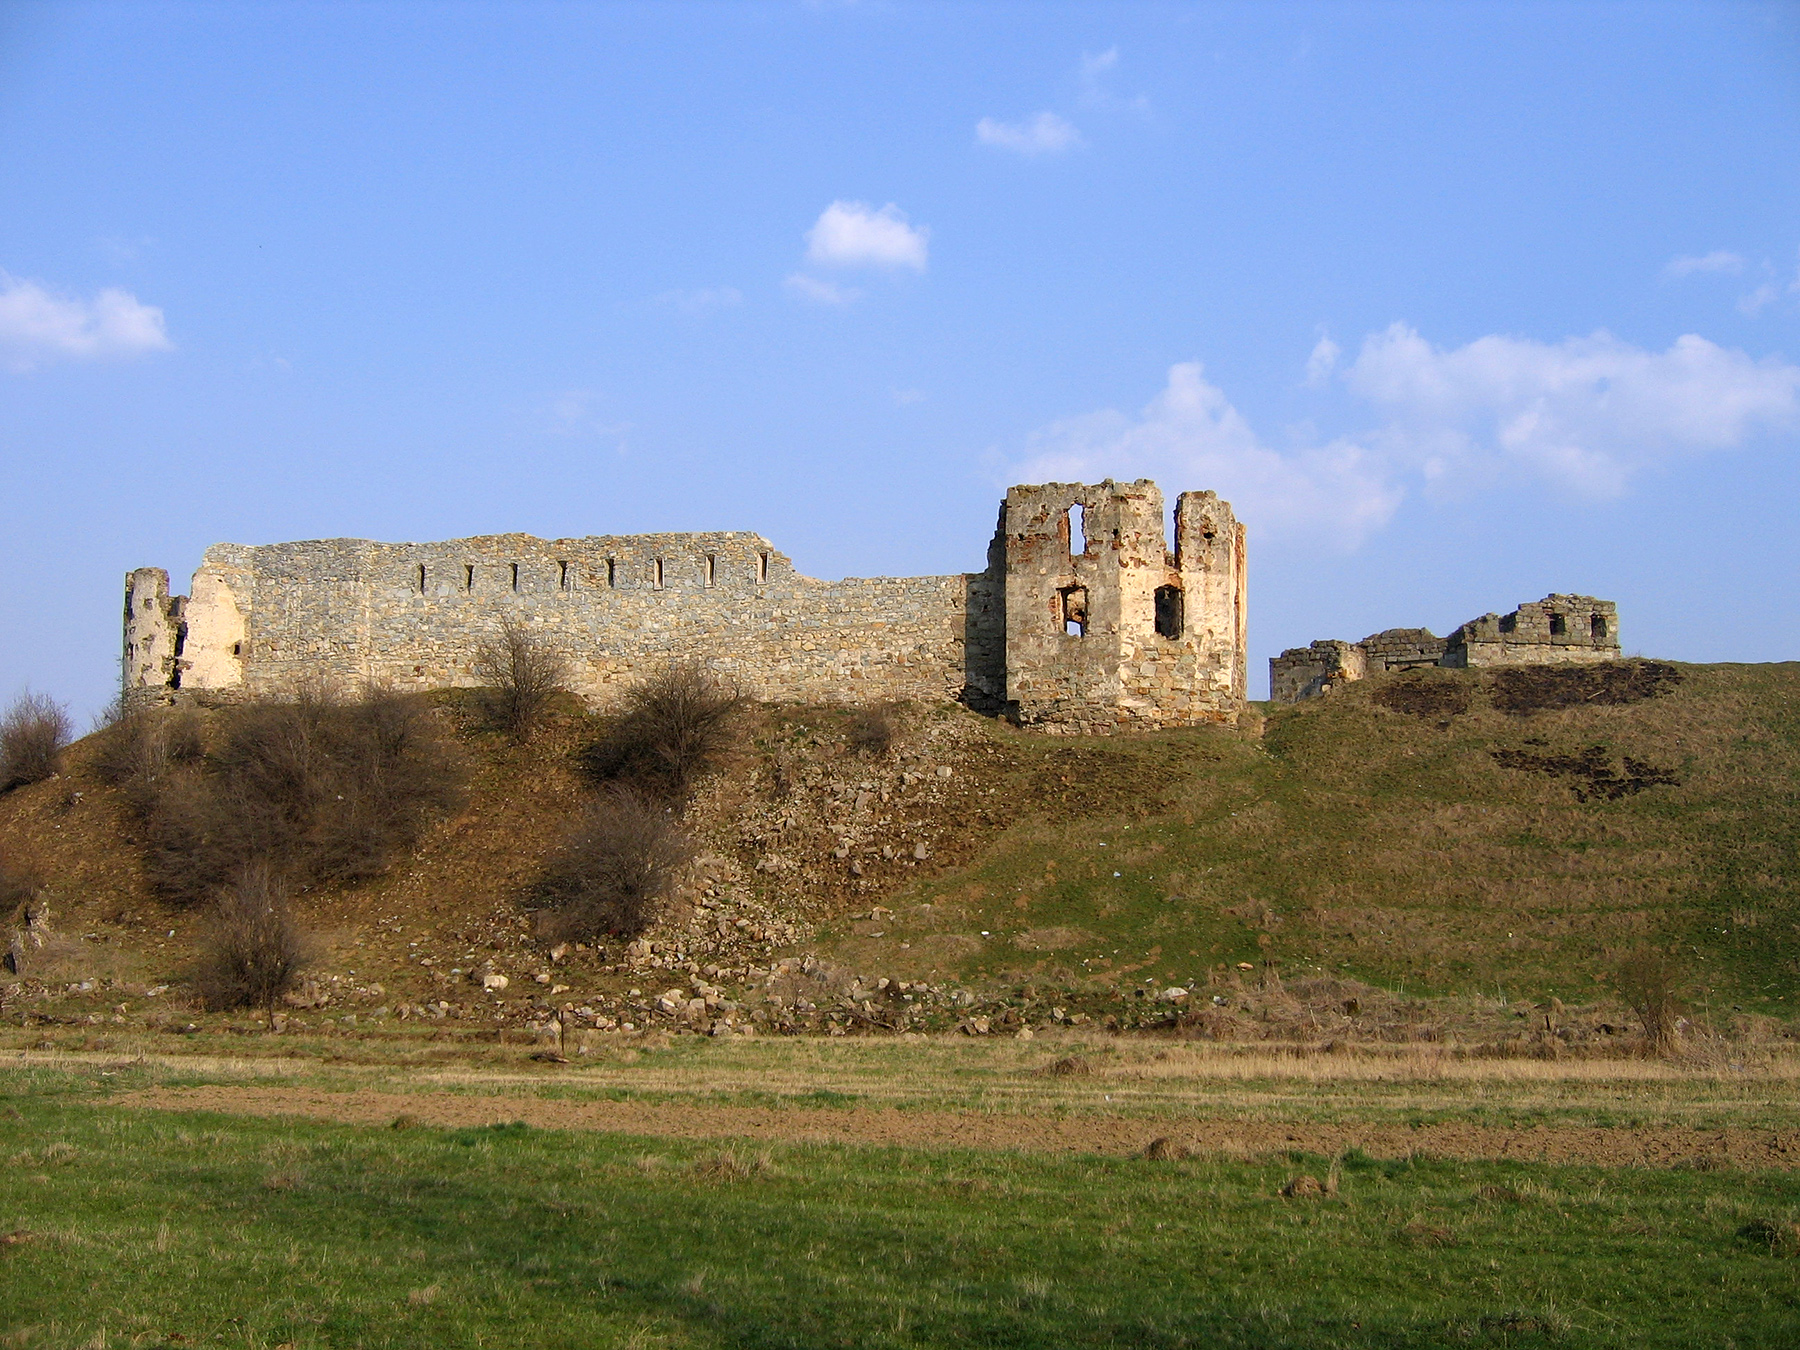 Файл:Pniv Castle RB.jpg — Вікіпедія